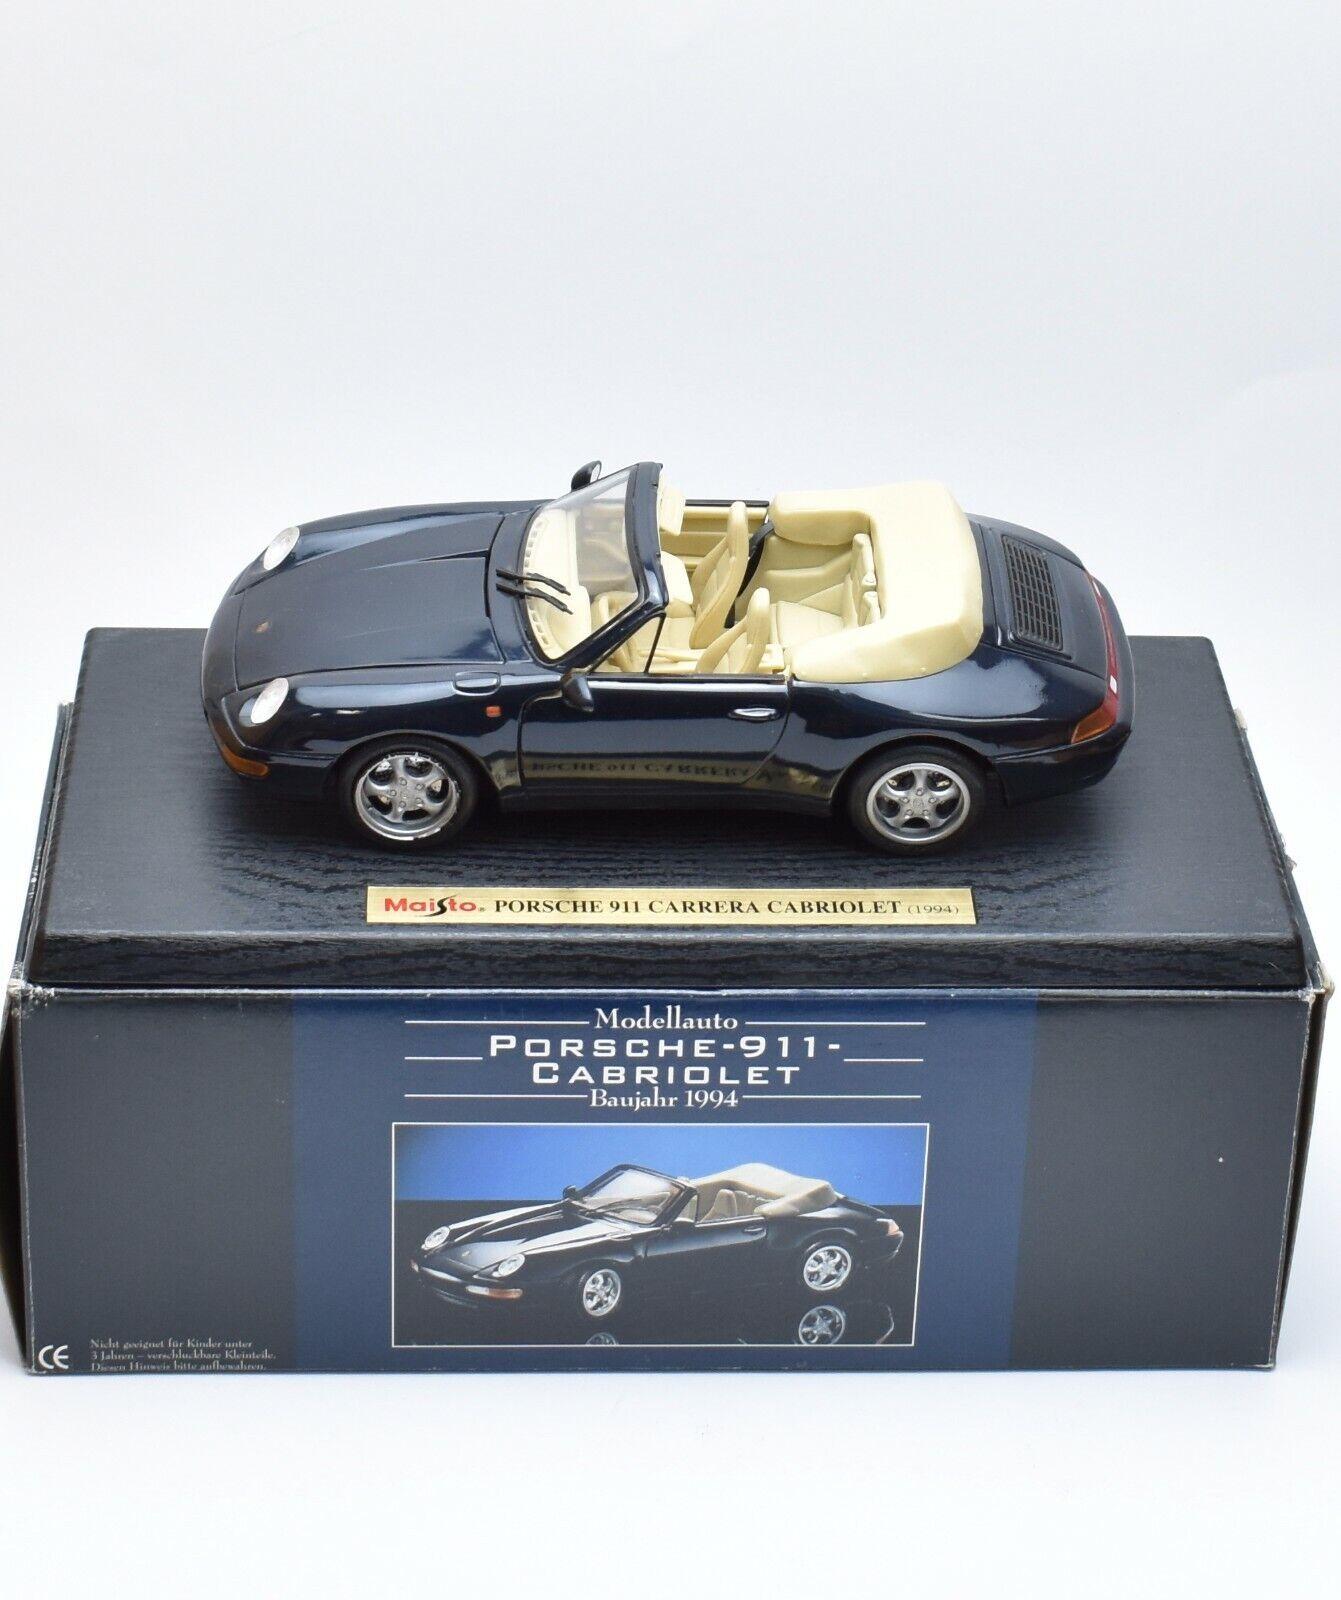 PORSCHE 911 Cabriolet Année de construction 1994 in Laqué Noir, Maisto, 1 18, NEUF dans sa boîte, k060